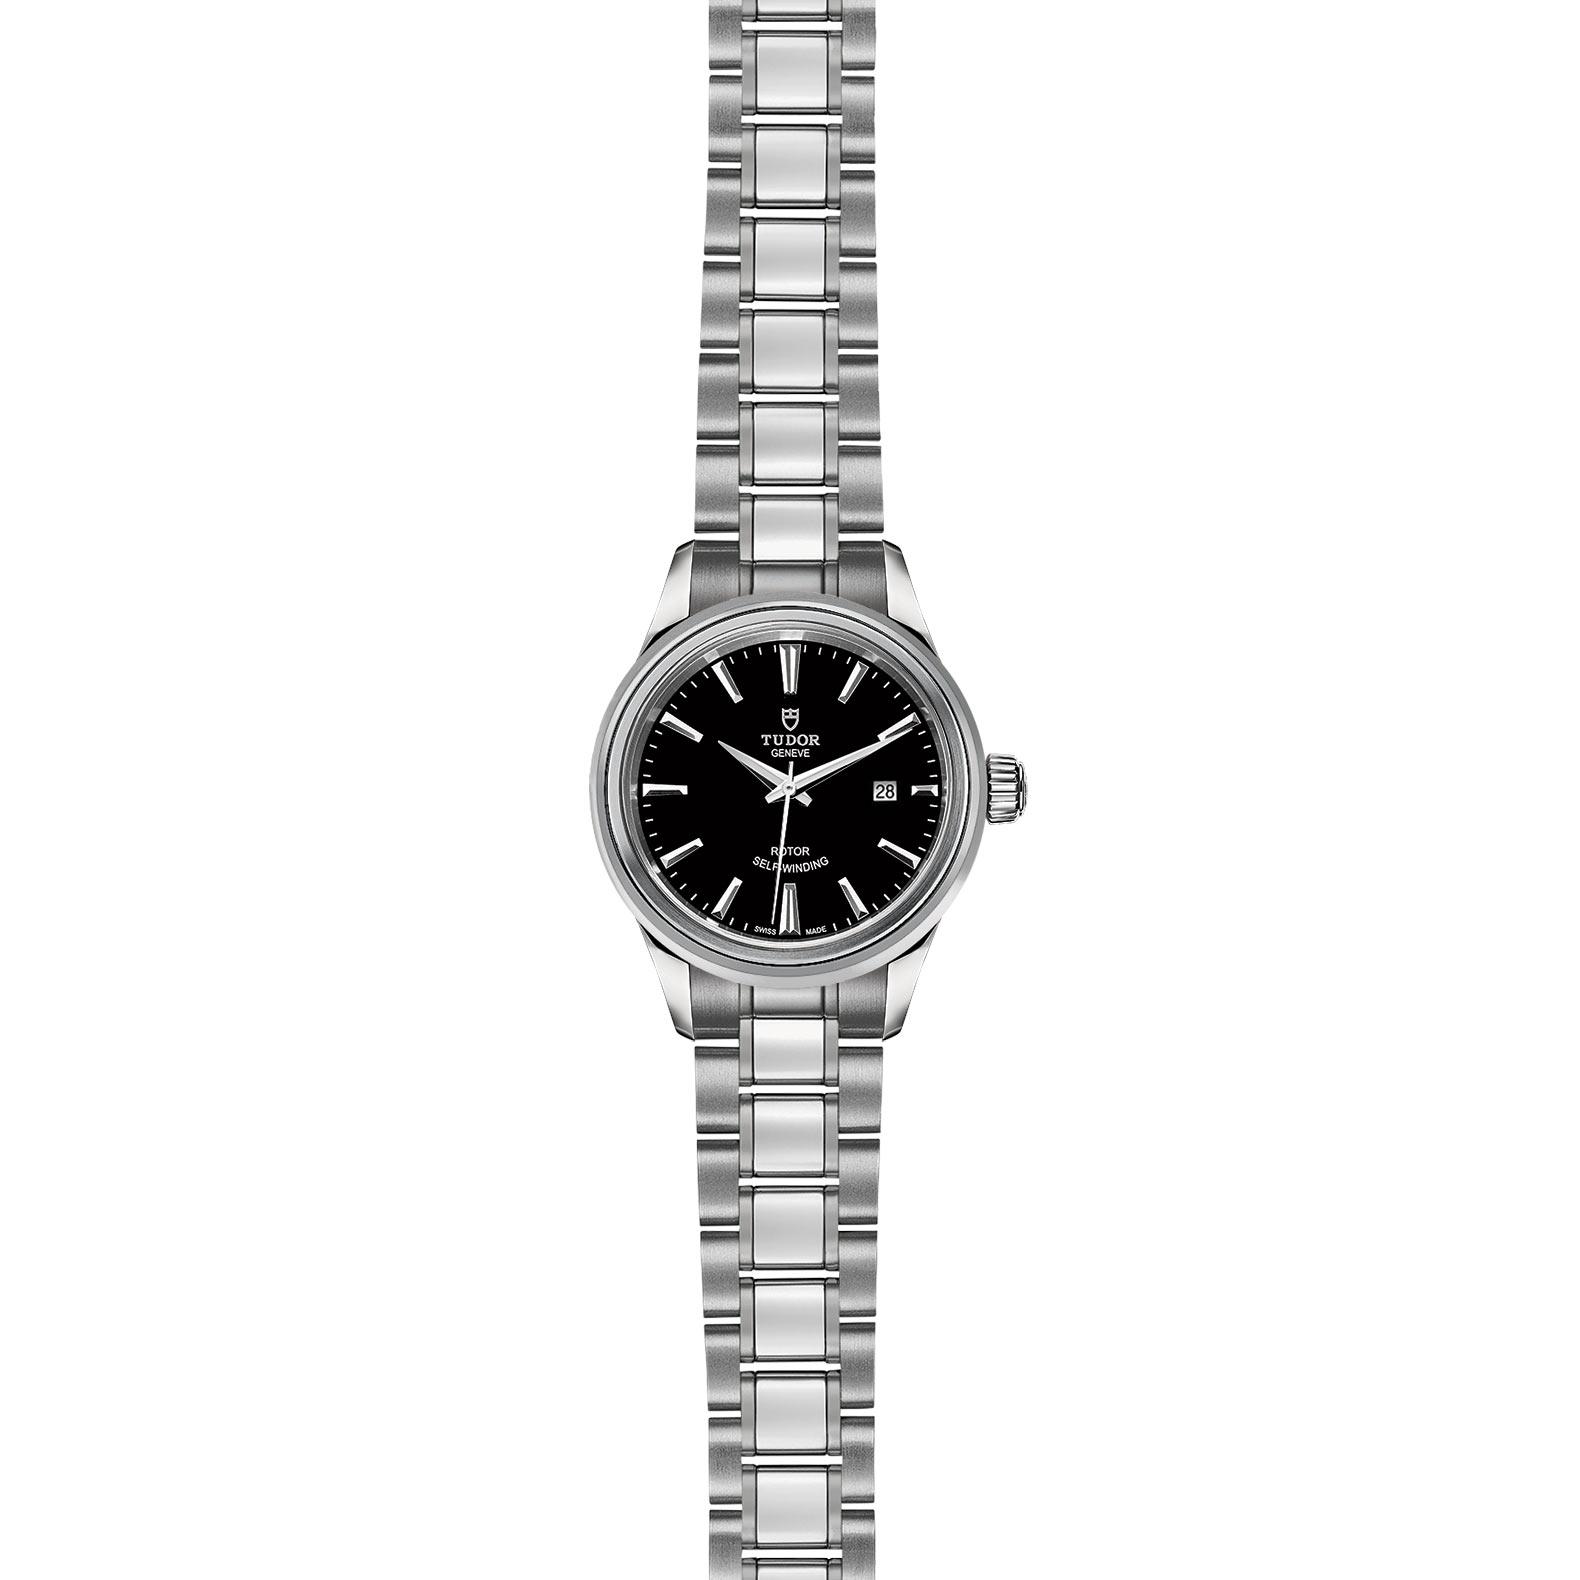 TUDOR Style M12100 0002 Frontfacing